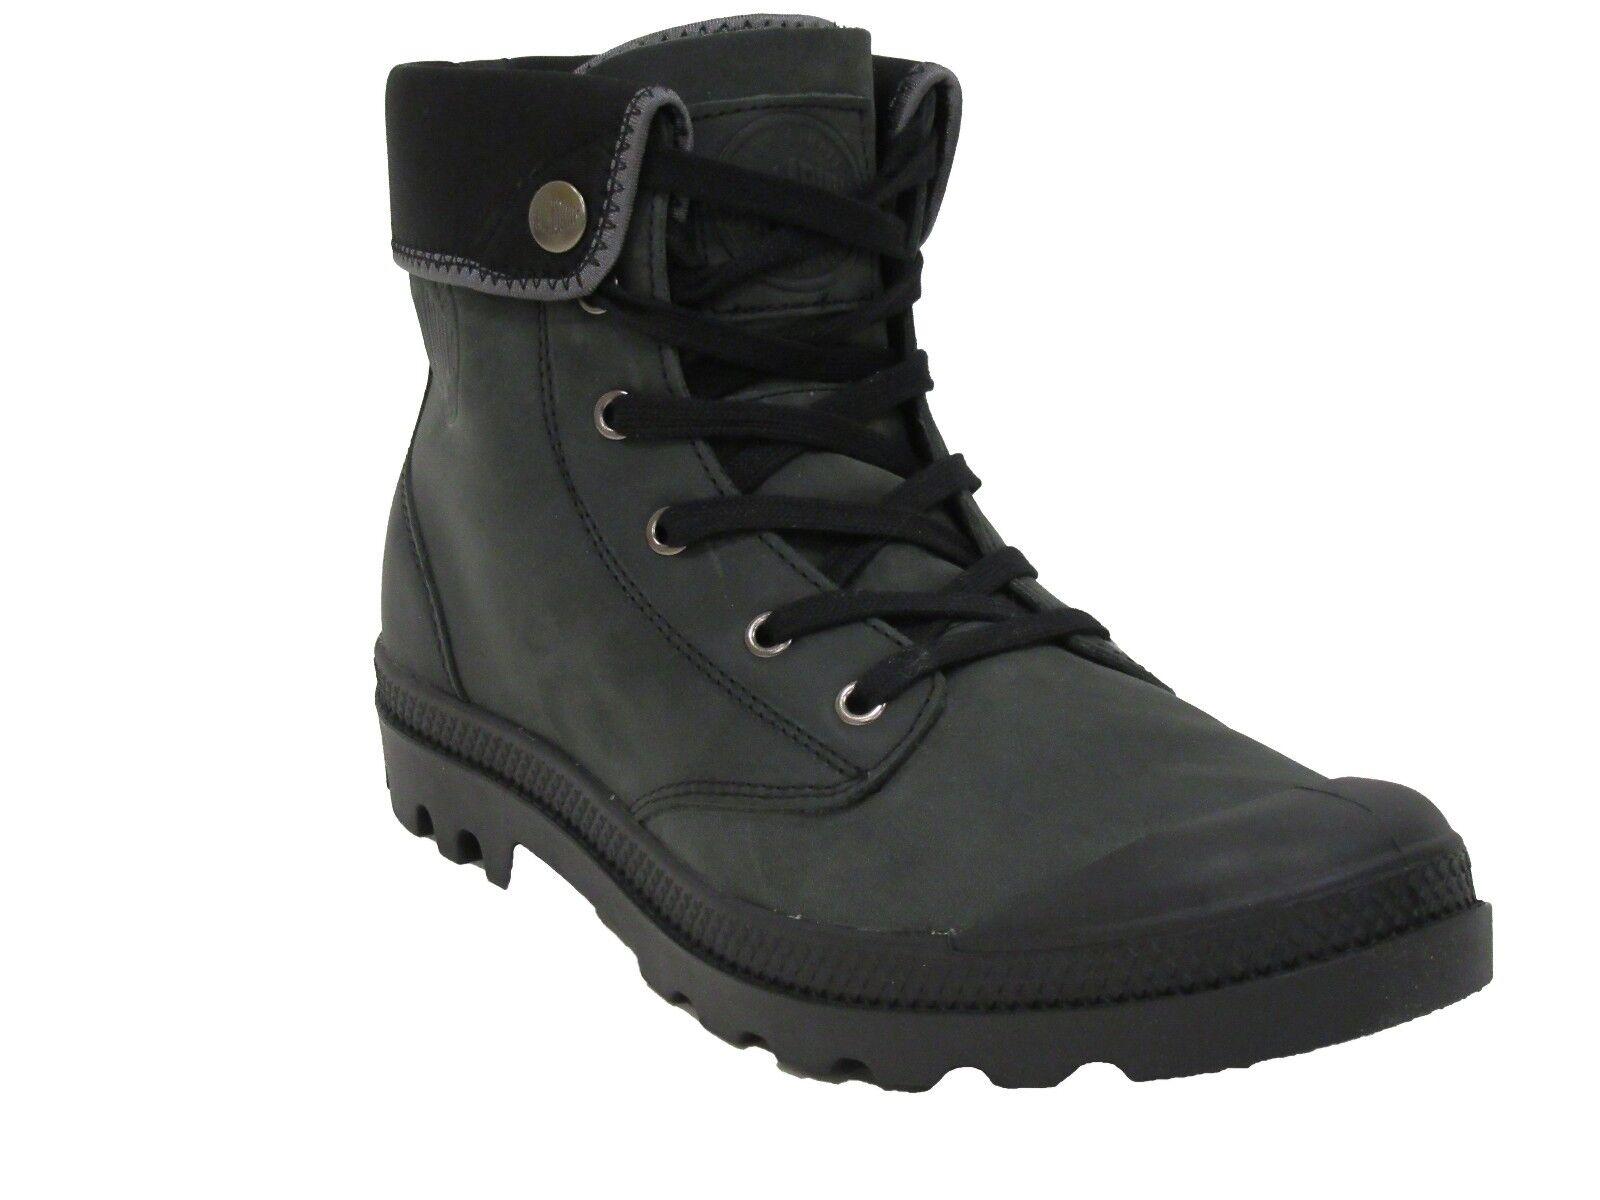 Palladium Men's HI SOCK NEO H BOOTS BLACK  1